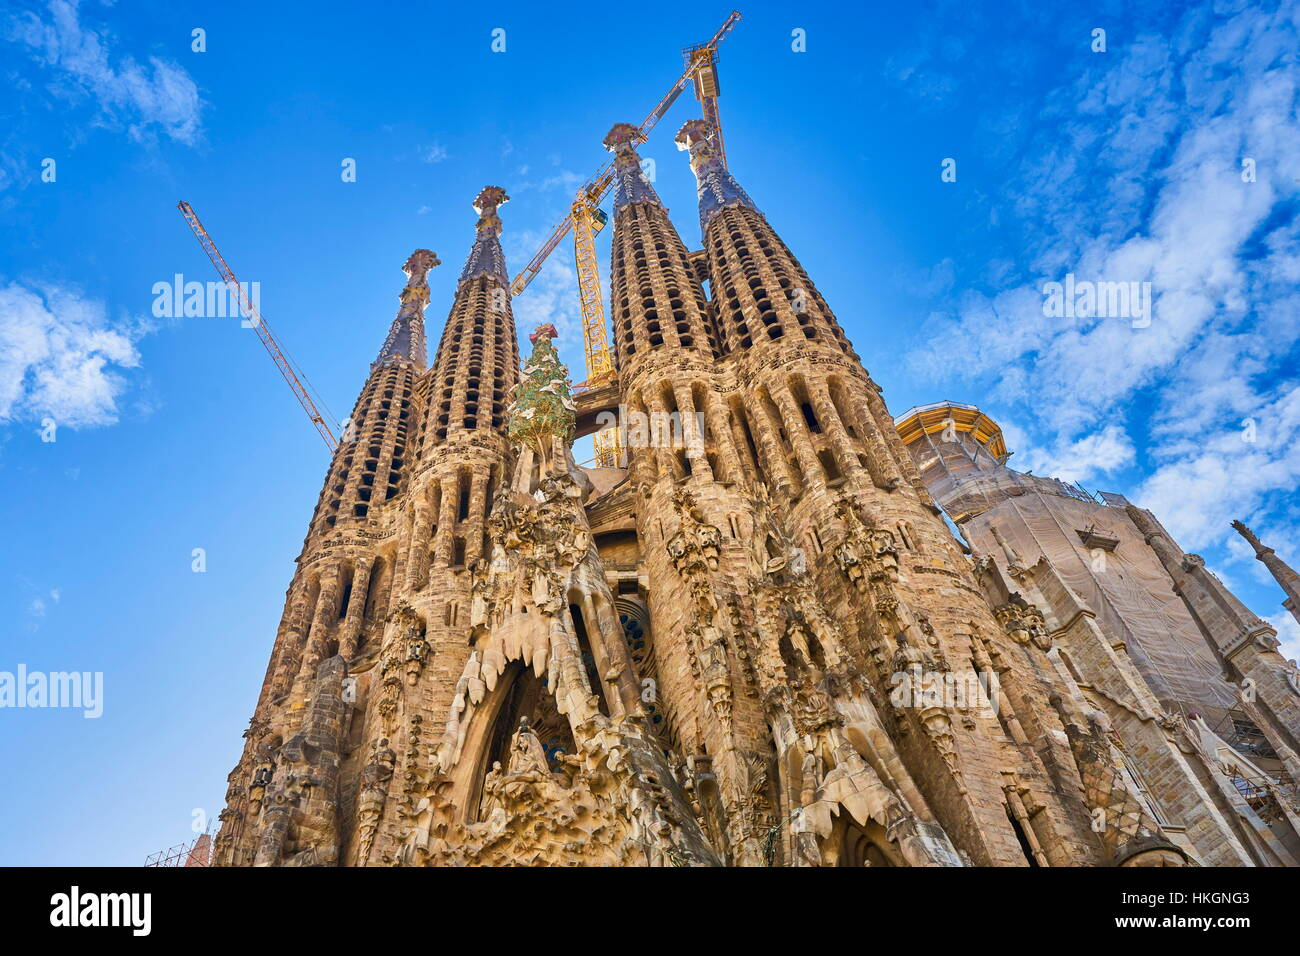 Sagrada Familia conçu par Antoni Gaudi, Barcelone, Catalogne, Espagne Photo Stock